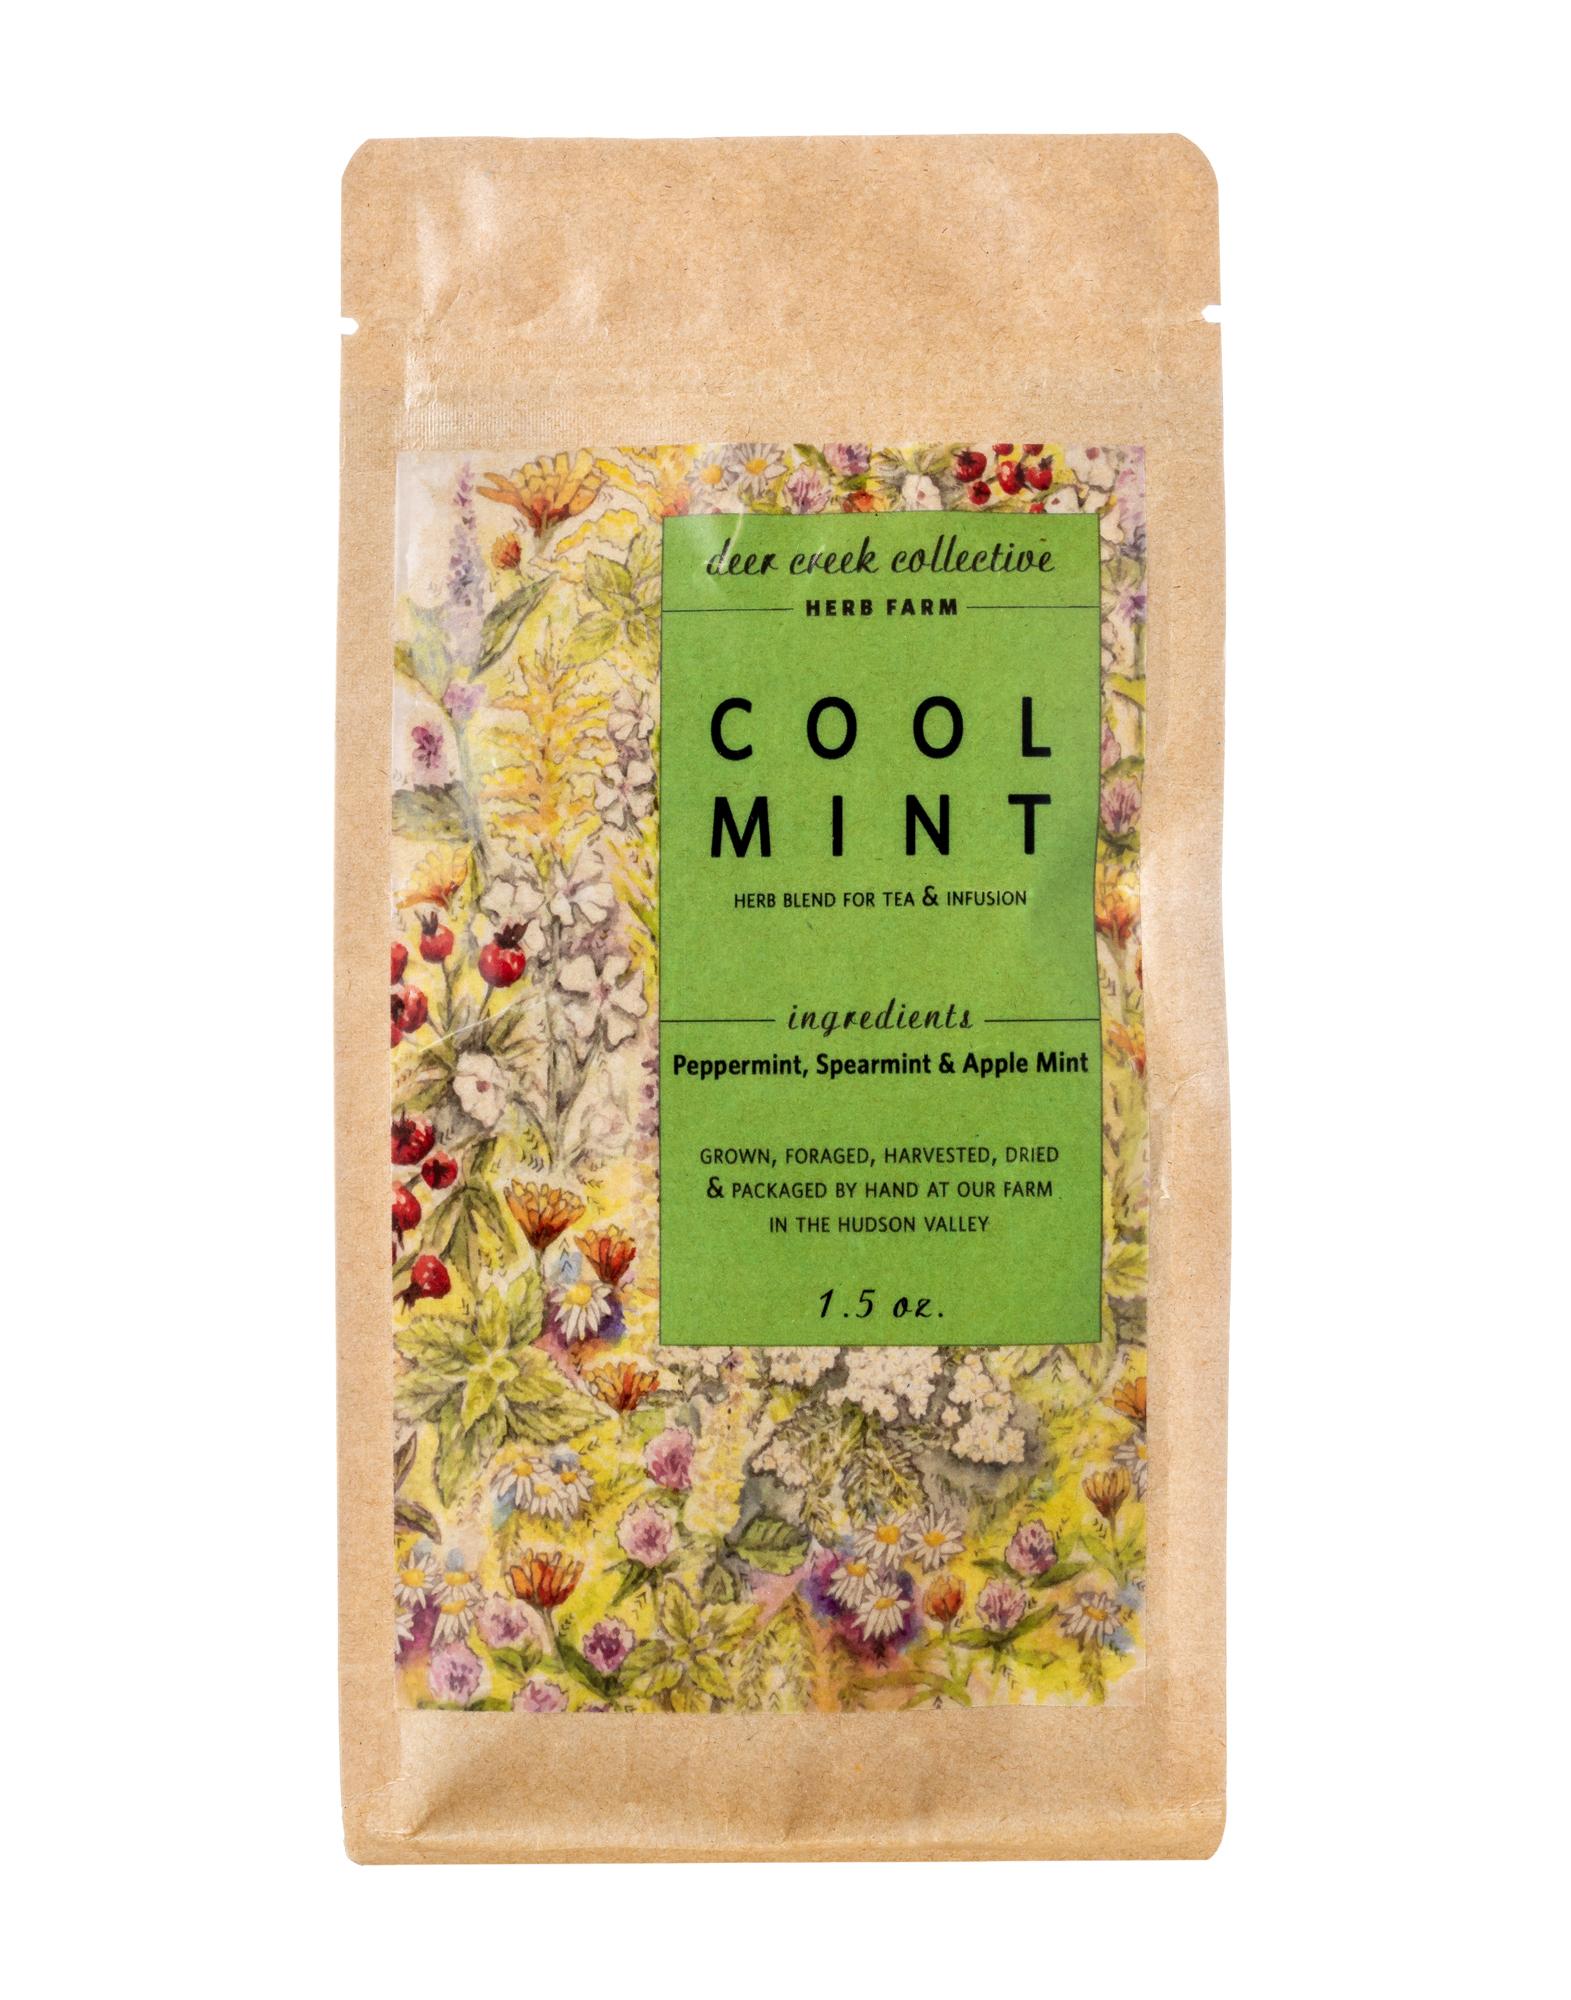 Mint Leaf Digestive Tea